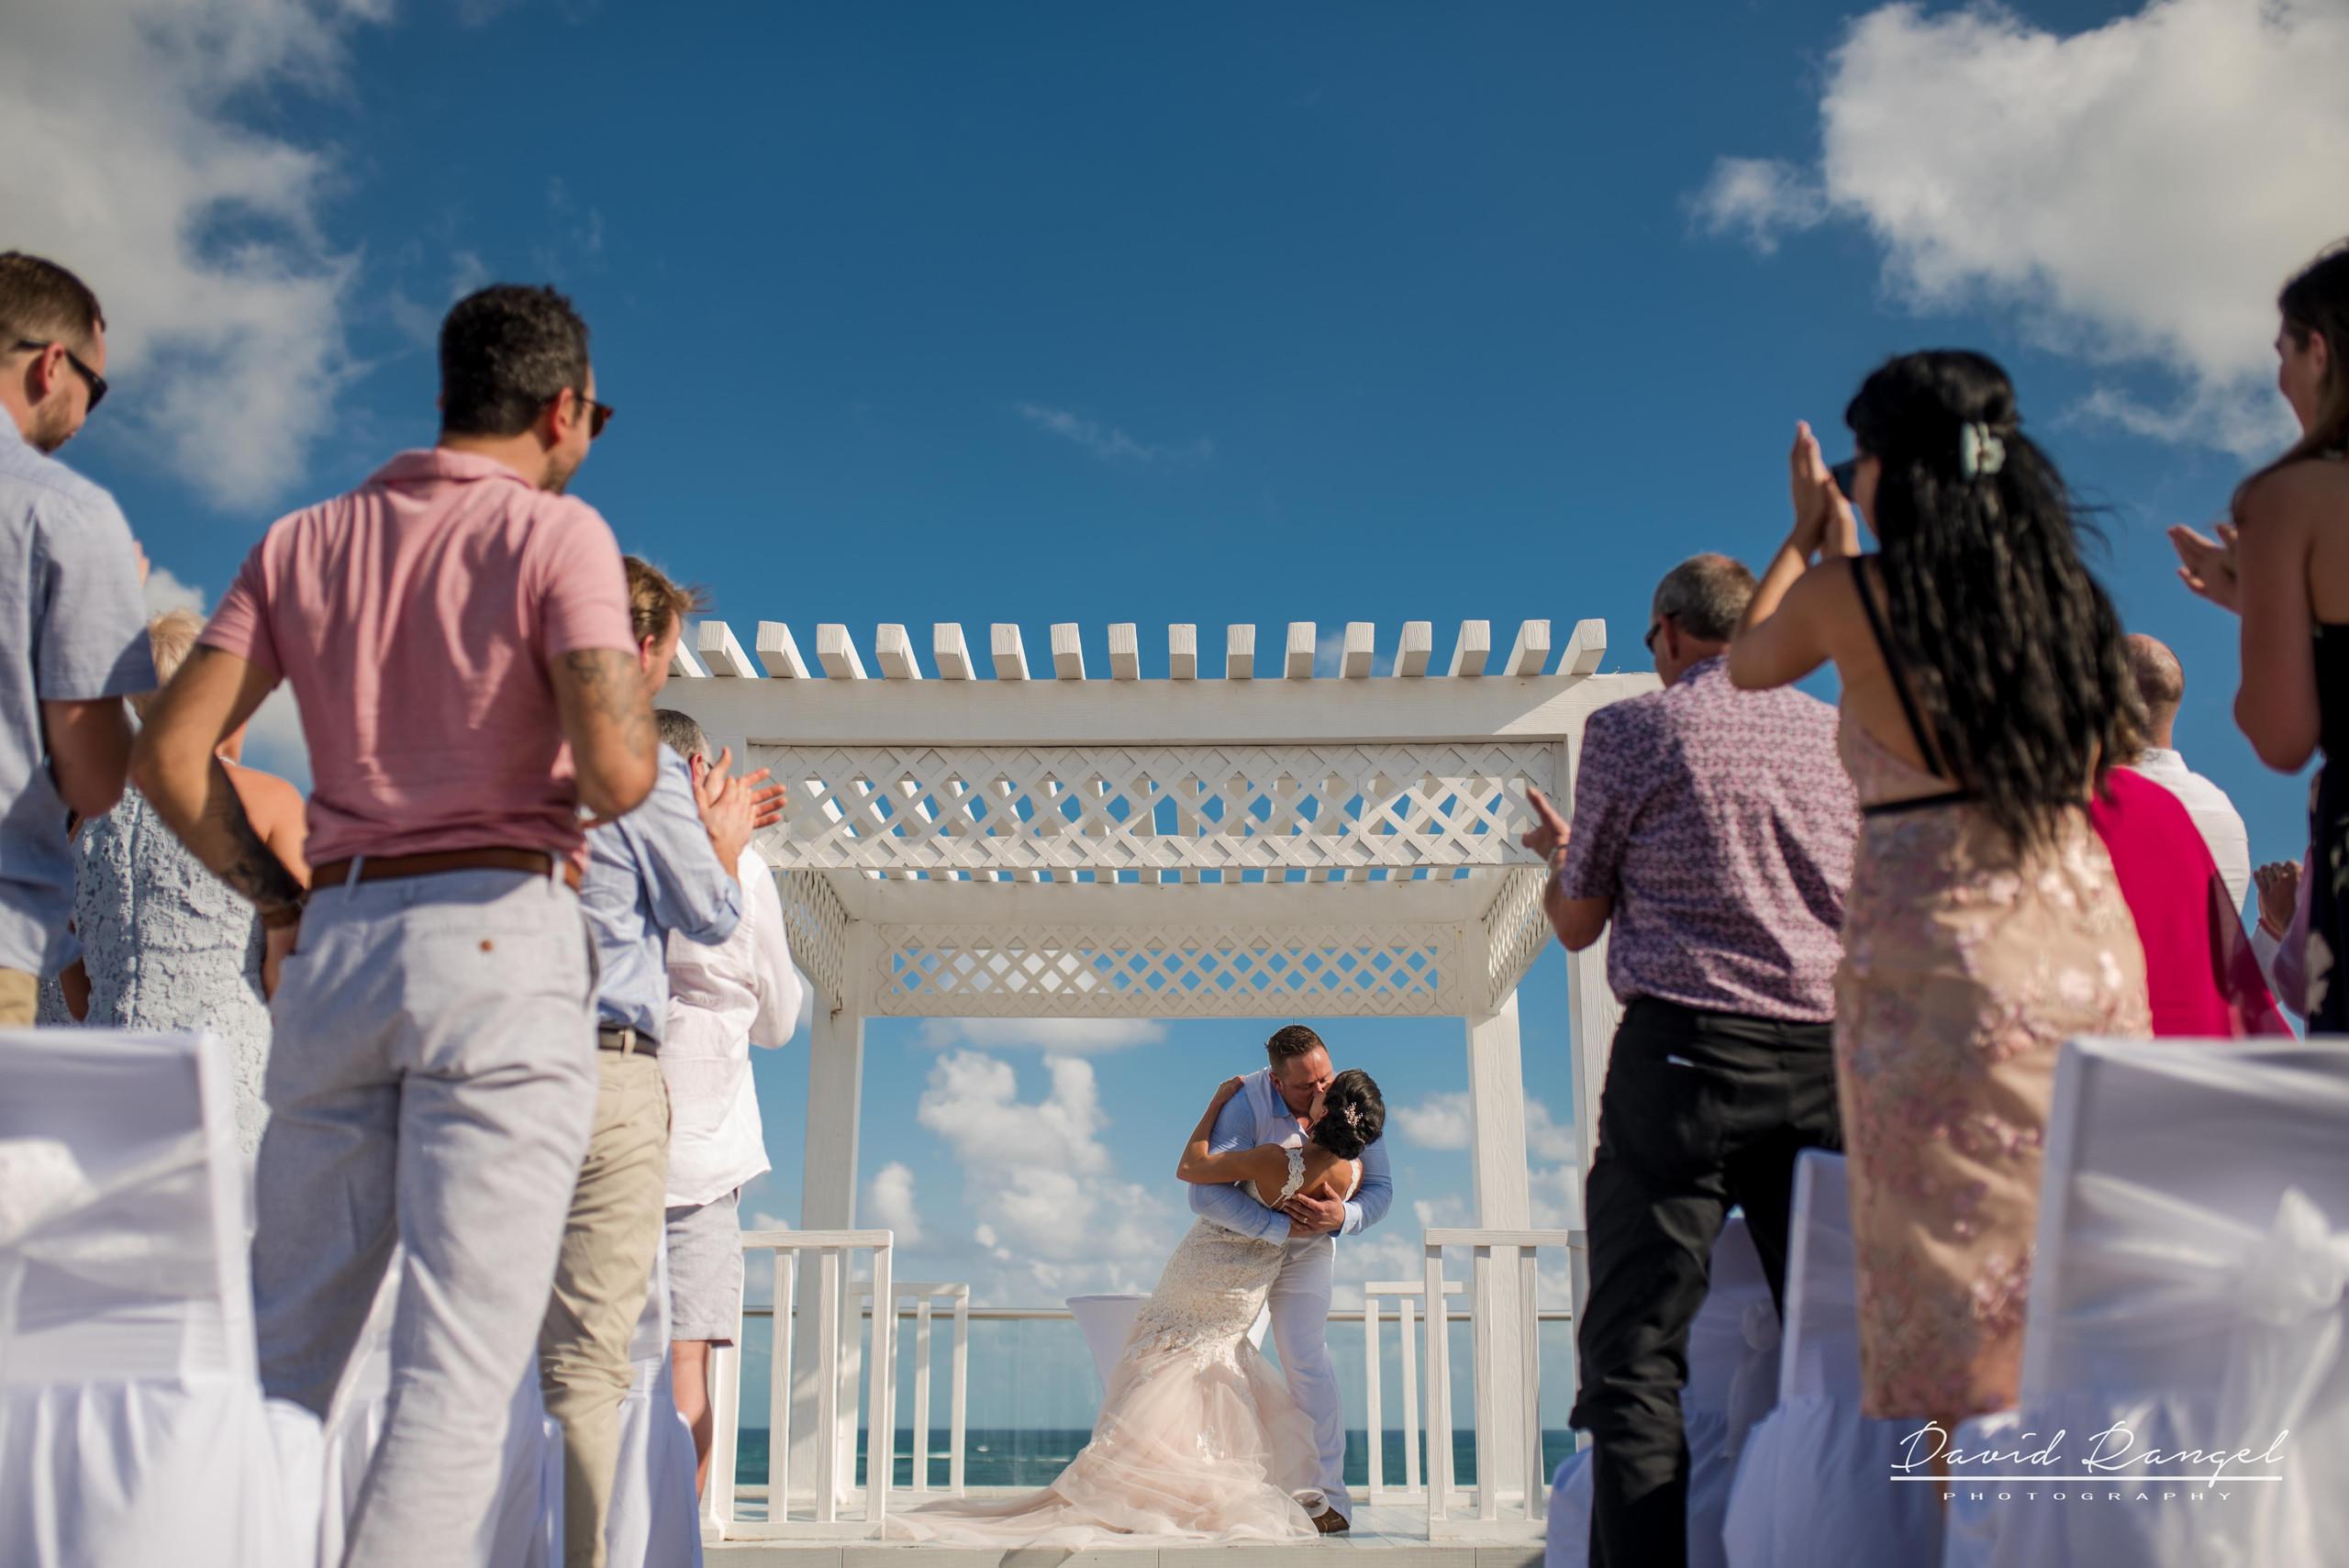 bride+groom+sky+deck+terrace+azul+beach+resort+photo+ceremony+gazebo+she+say+yes+kiss+married